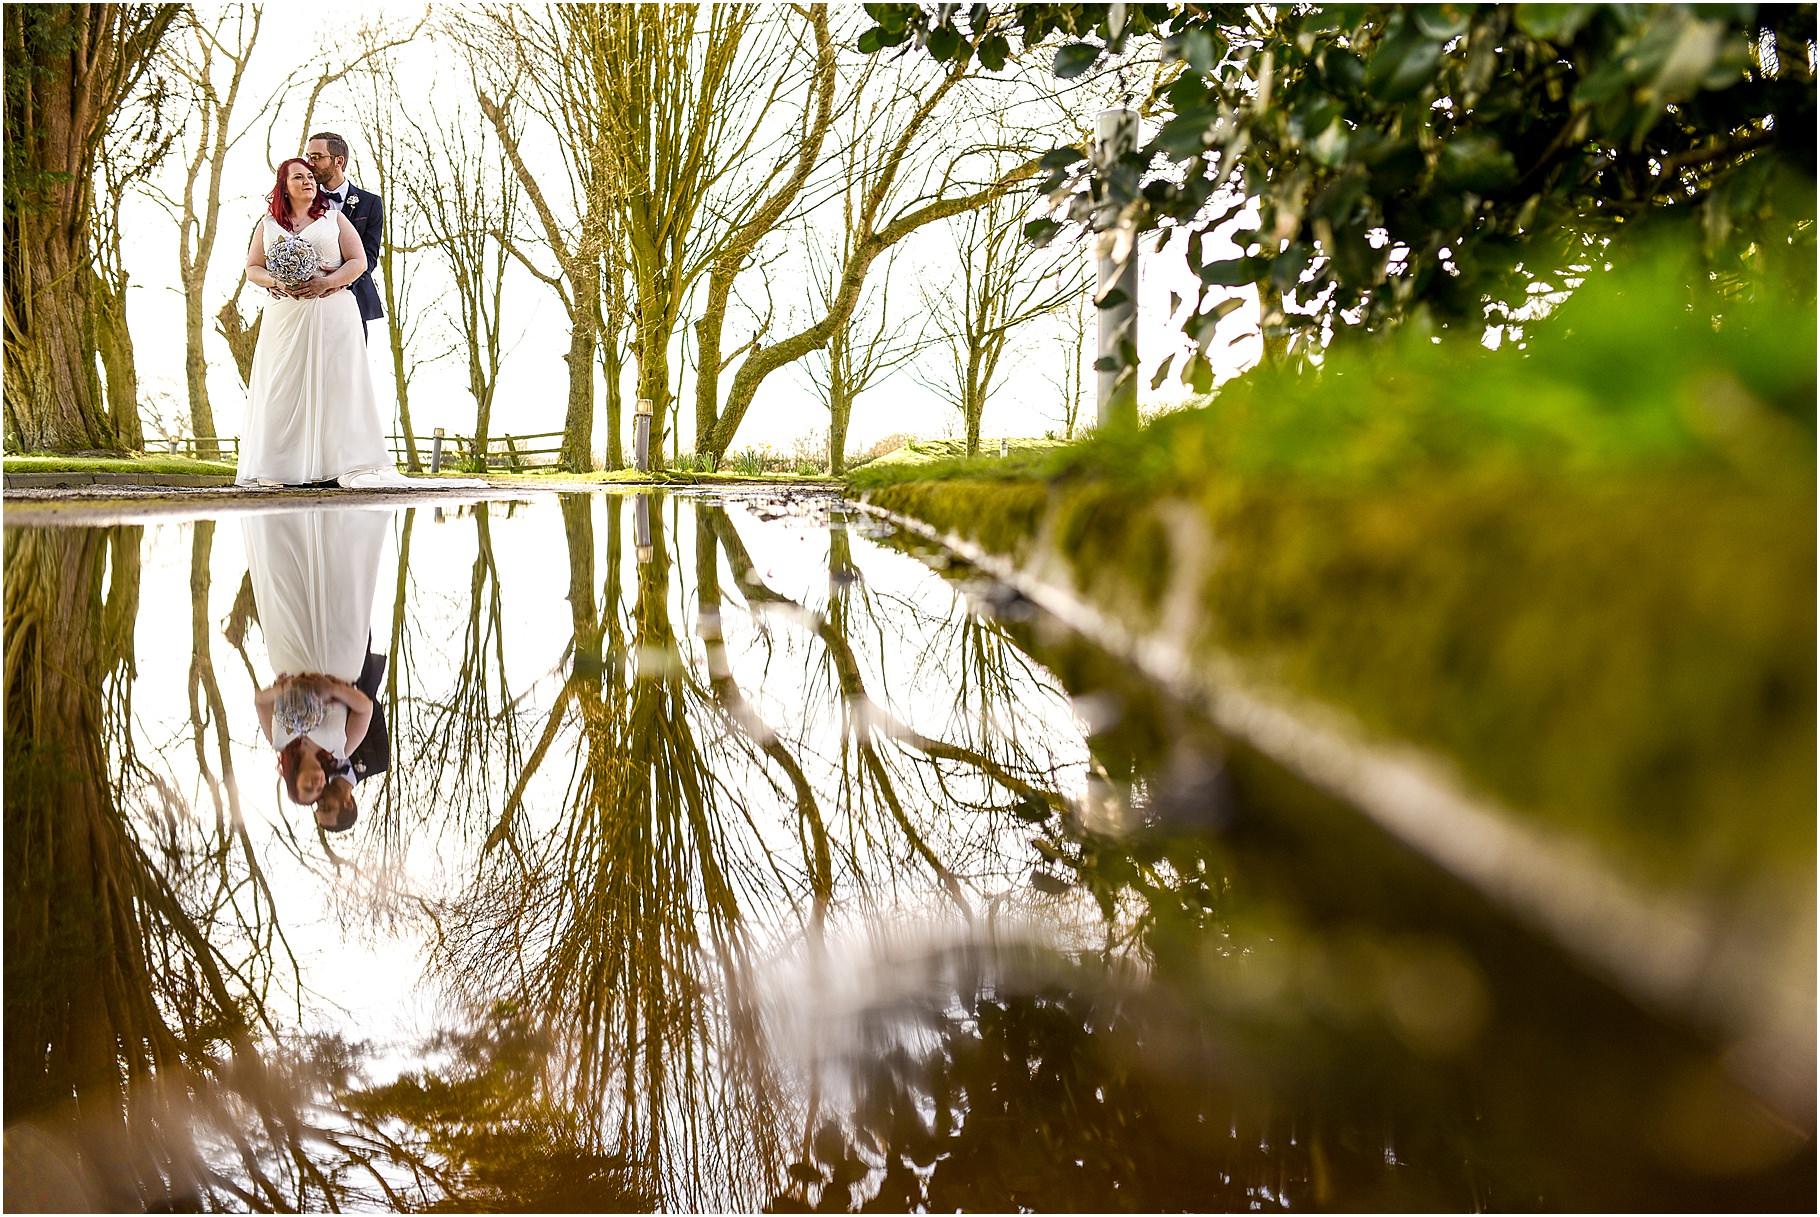 dan-wootton-photography-2017-weddings-075.jpg